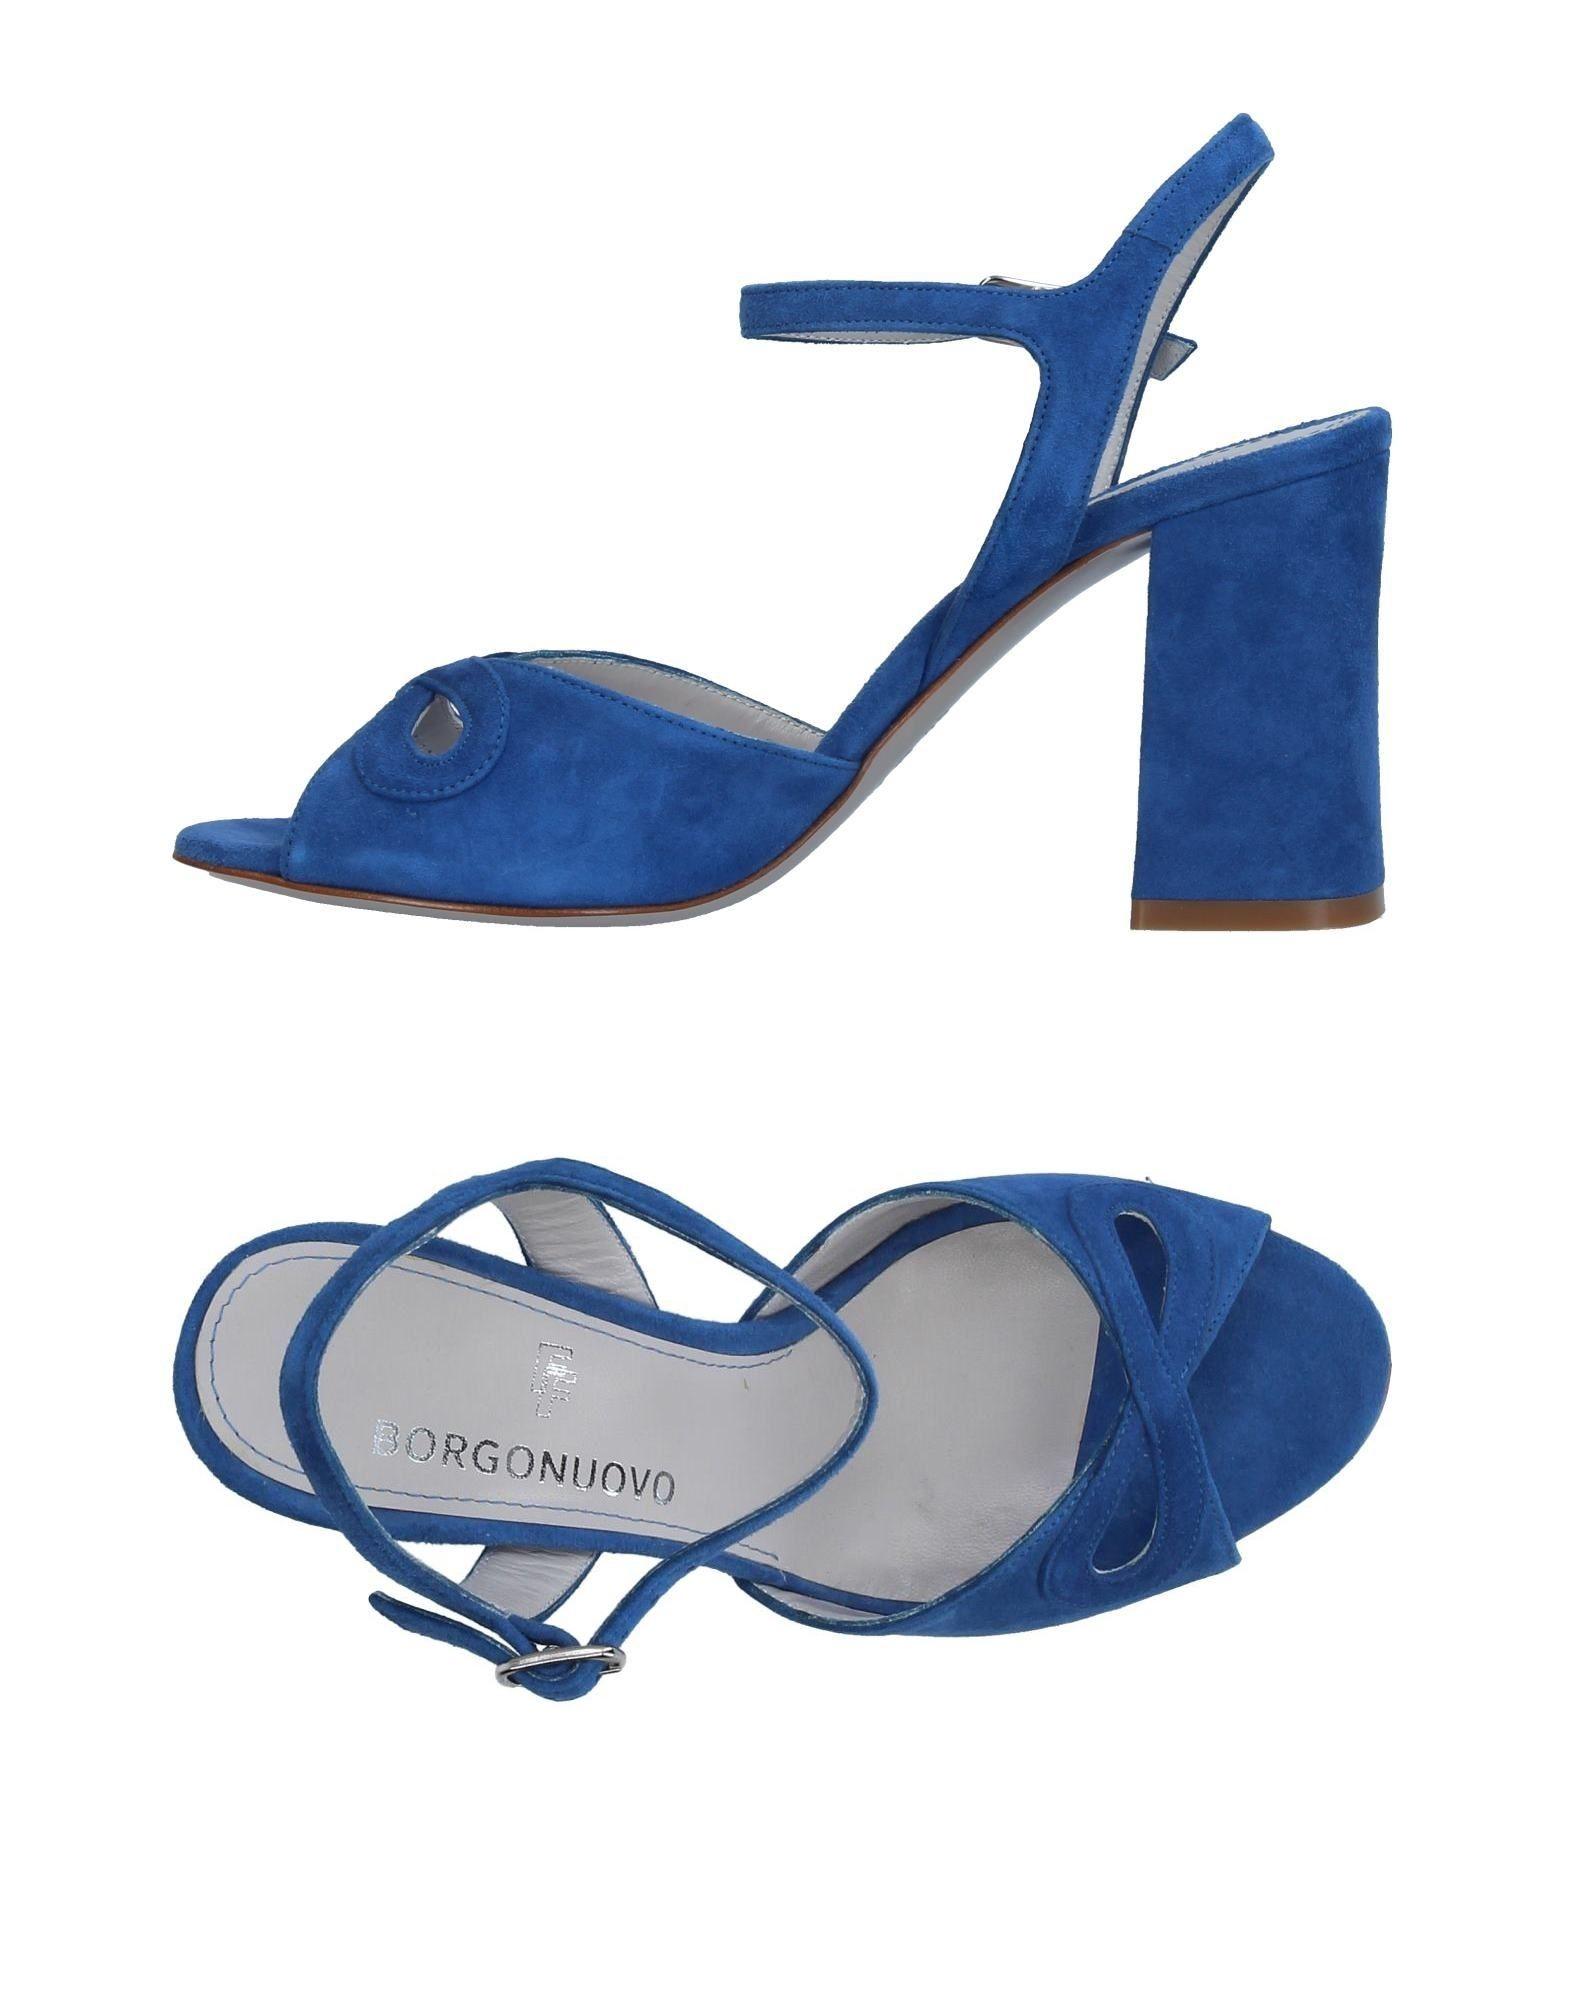 Borgonuovo Sandalen Damen  11364094SH Gute Qualität beliebte Schuhe